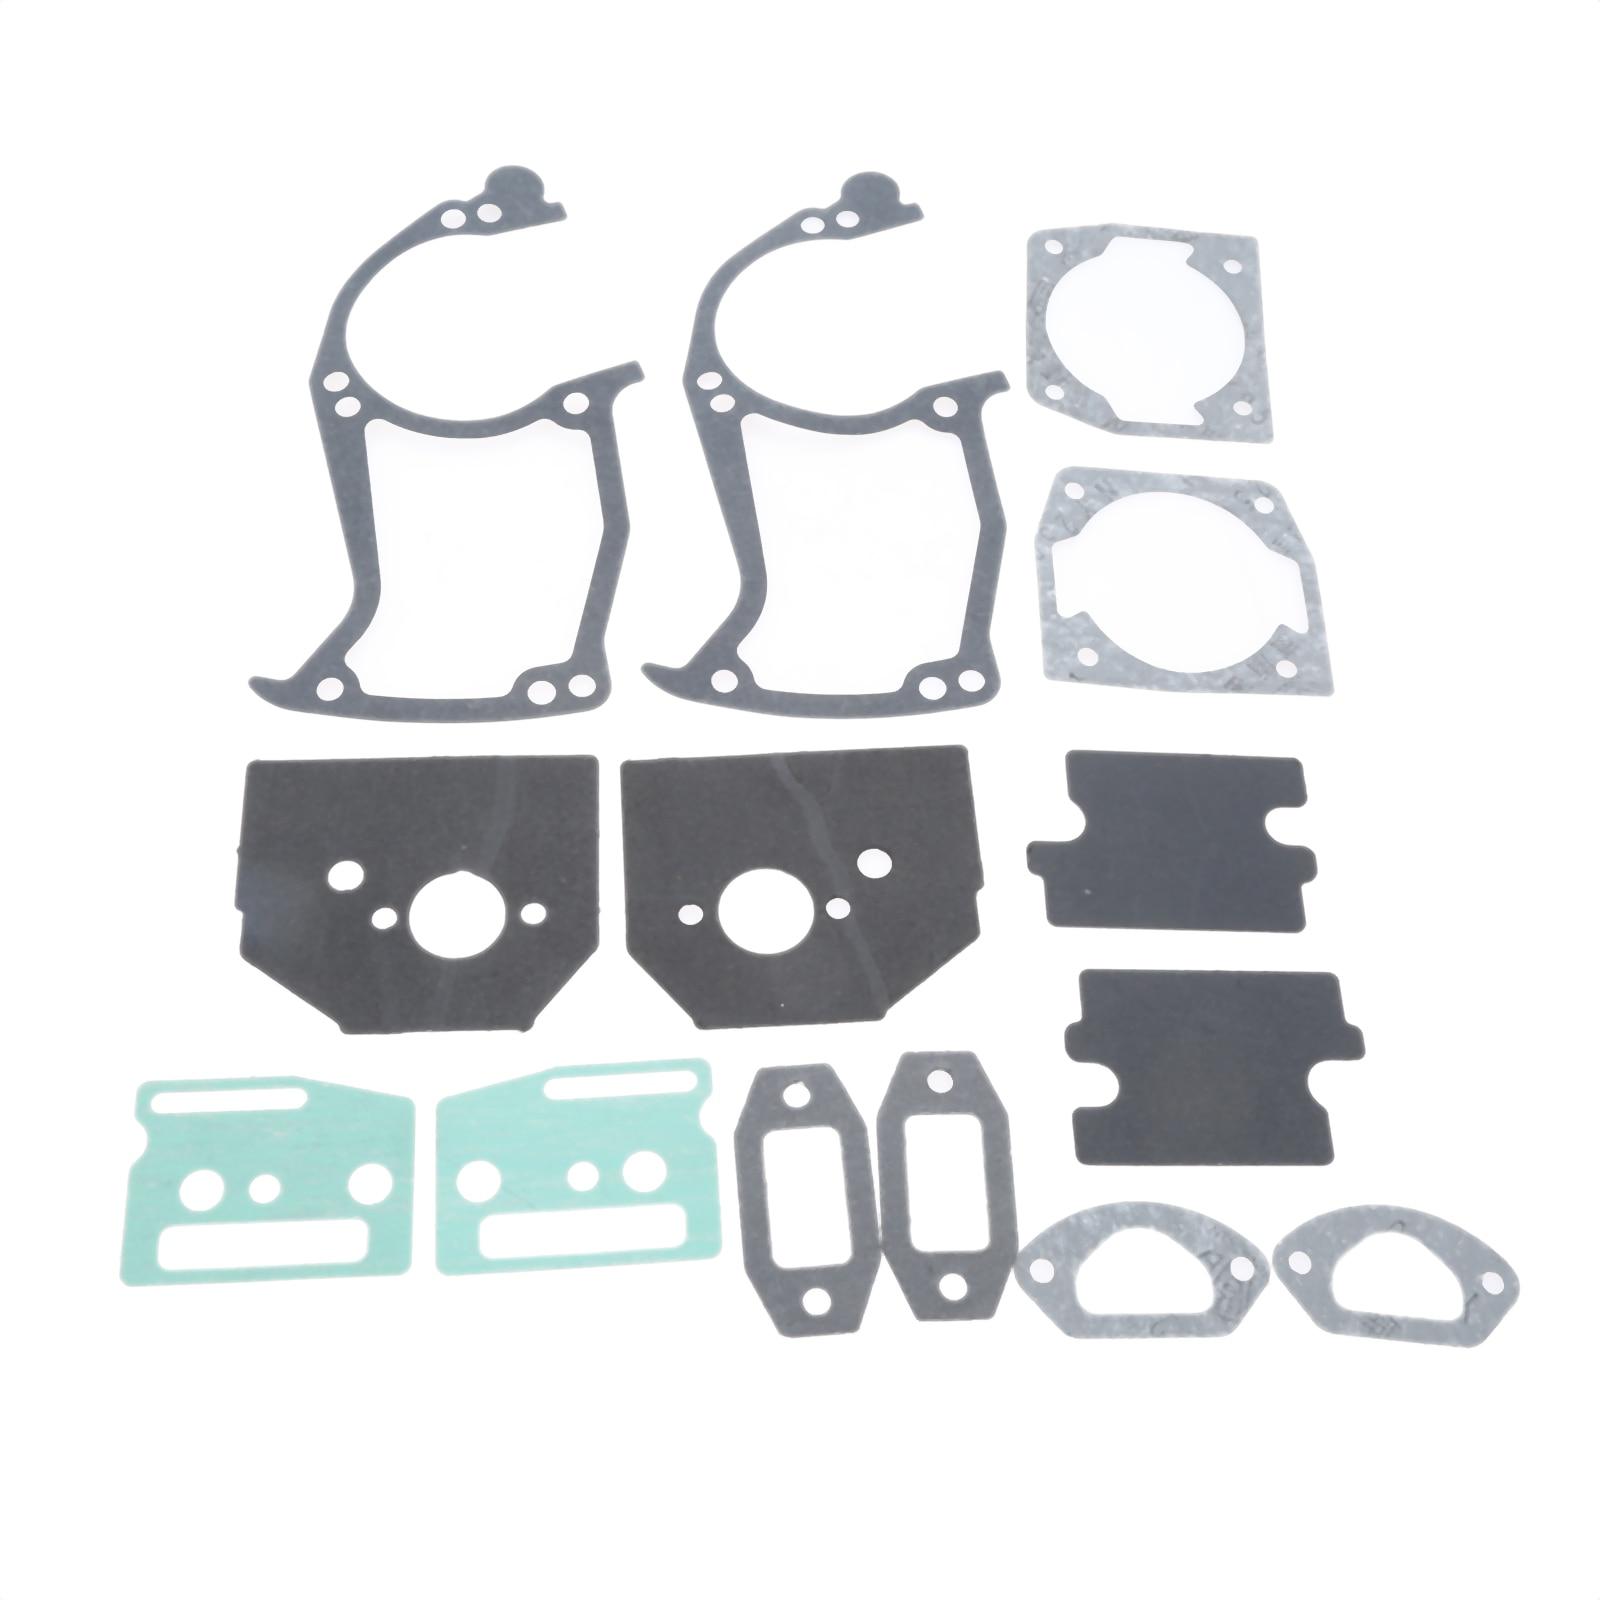 DRELD 2 Sets 45cc 52cc 58cc Chainsaw Paper Gaskets Full Set Fit For 45CC 52CC 58CC Chainsaw Garden Tool Parts